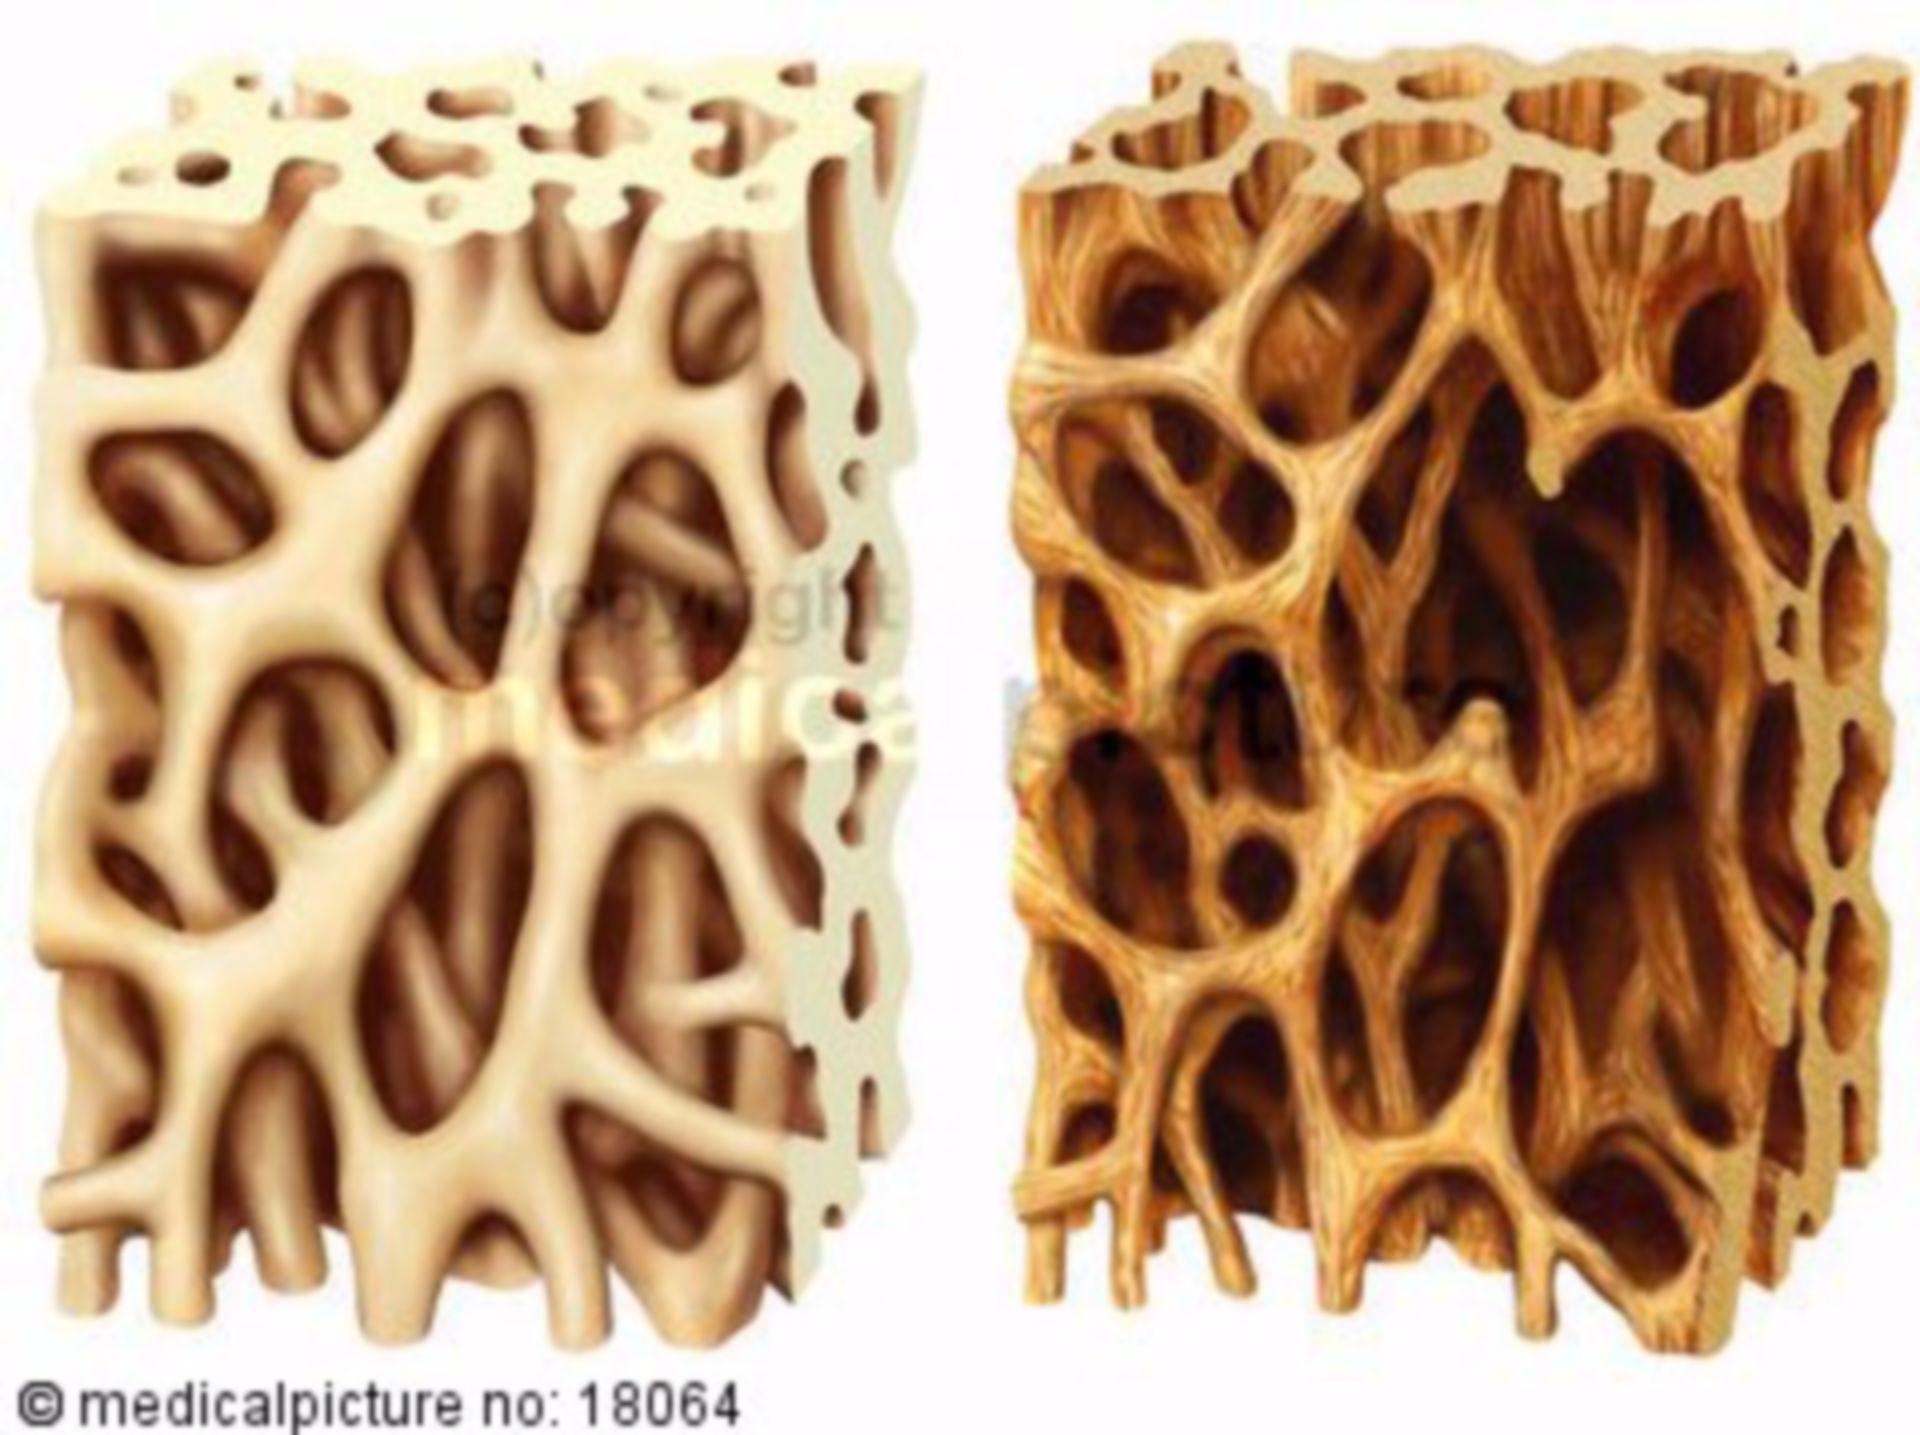 Healthy bone vs. osteoporosis